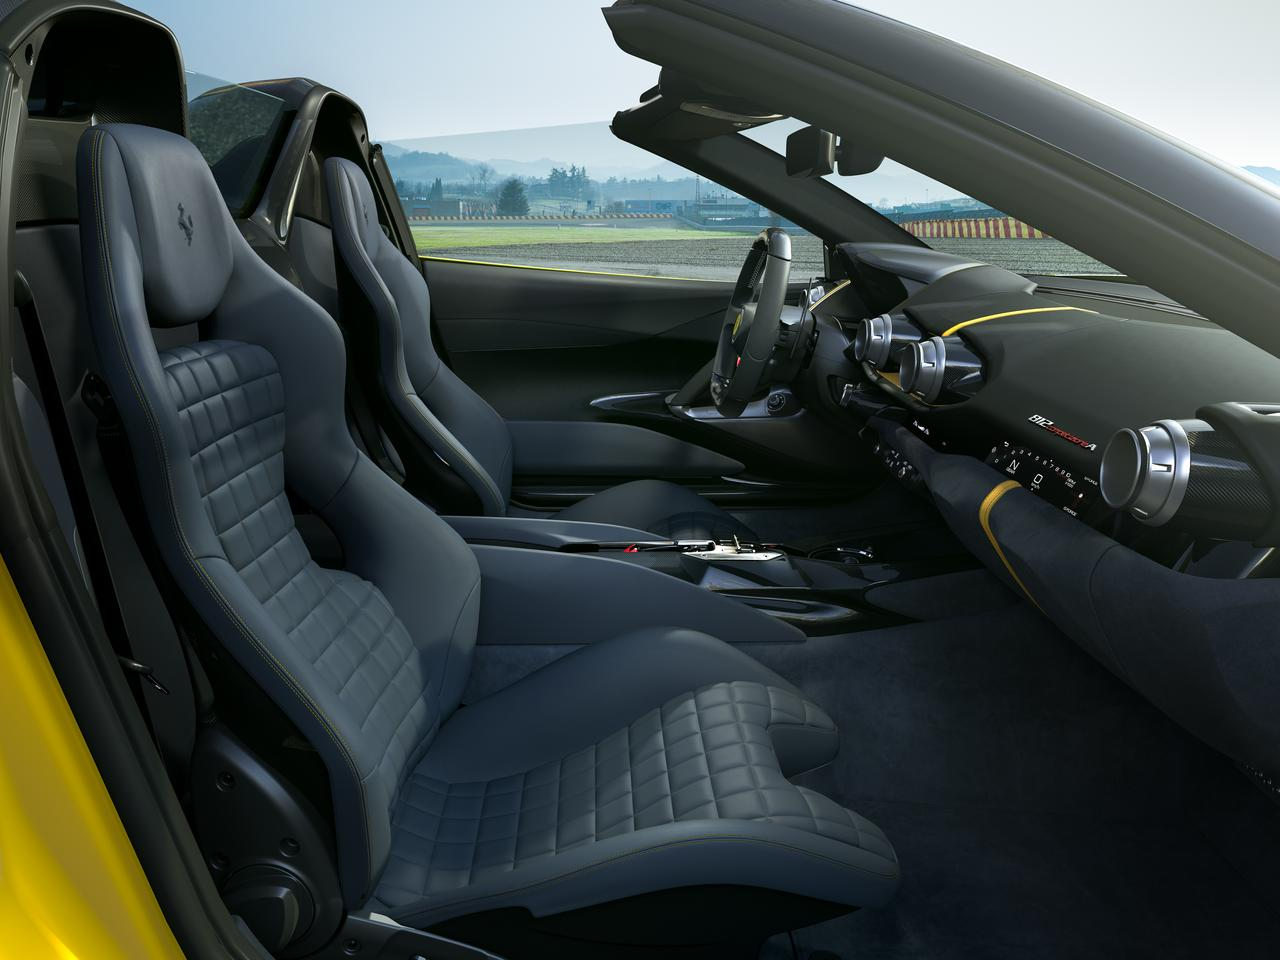 A look inside Ferrari's new 812 Competizione